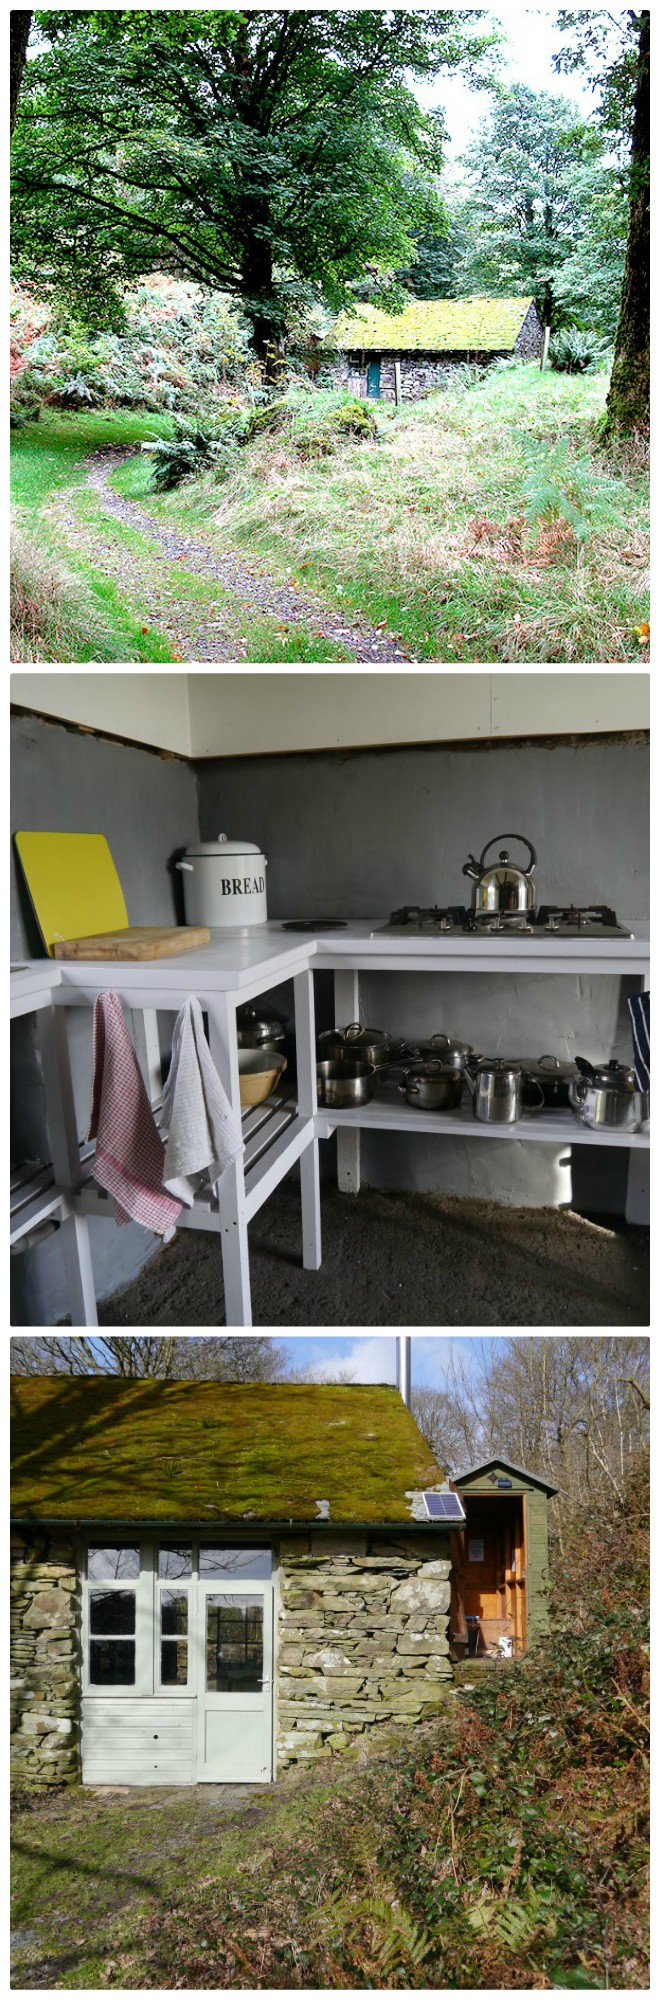 lovely rural environmentally friendly  camping barn